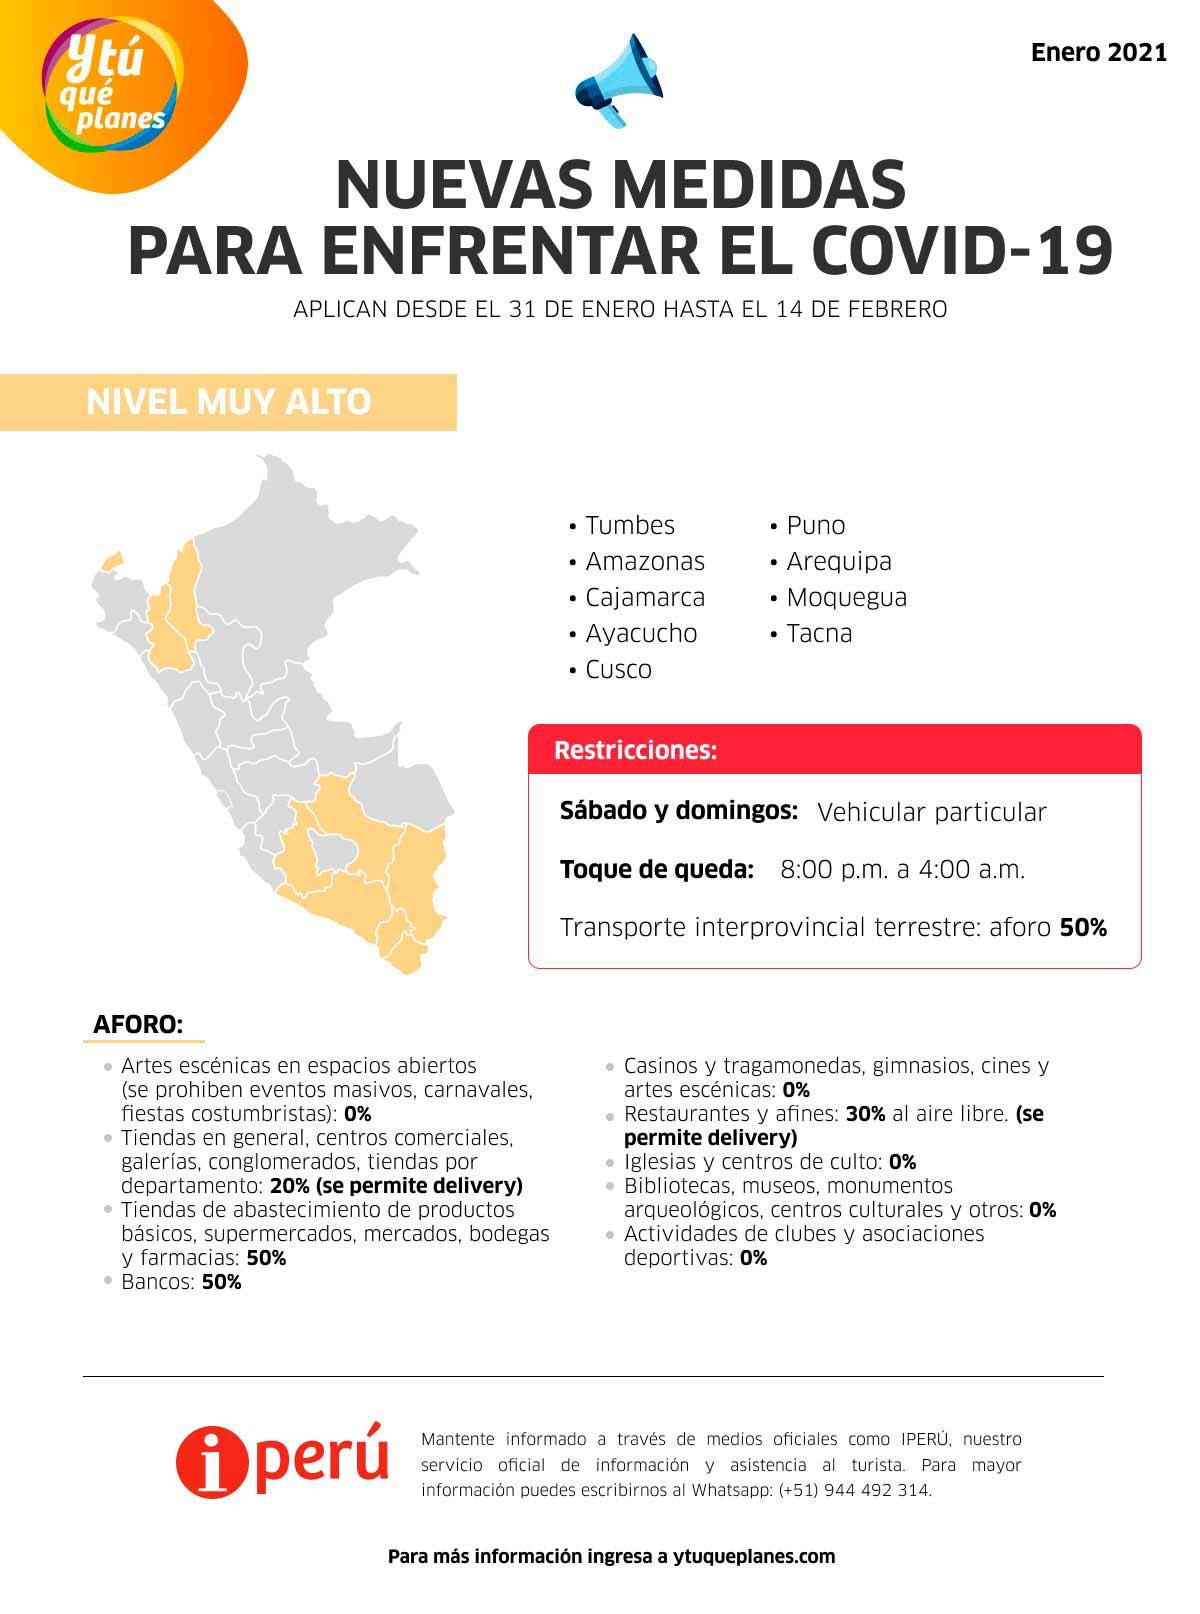 Regiones de Nivel Muy Alto Covid-19